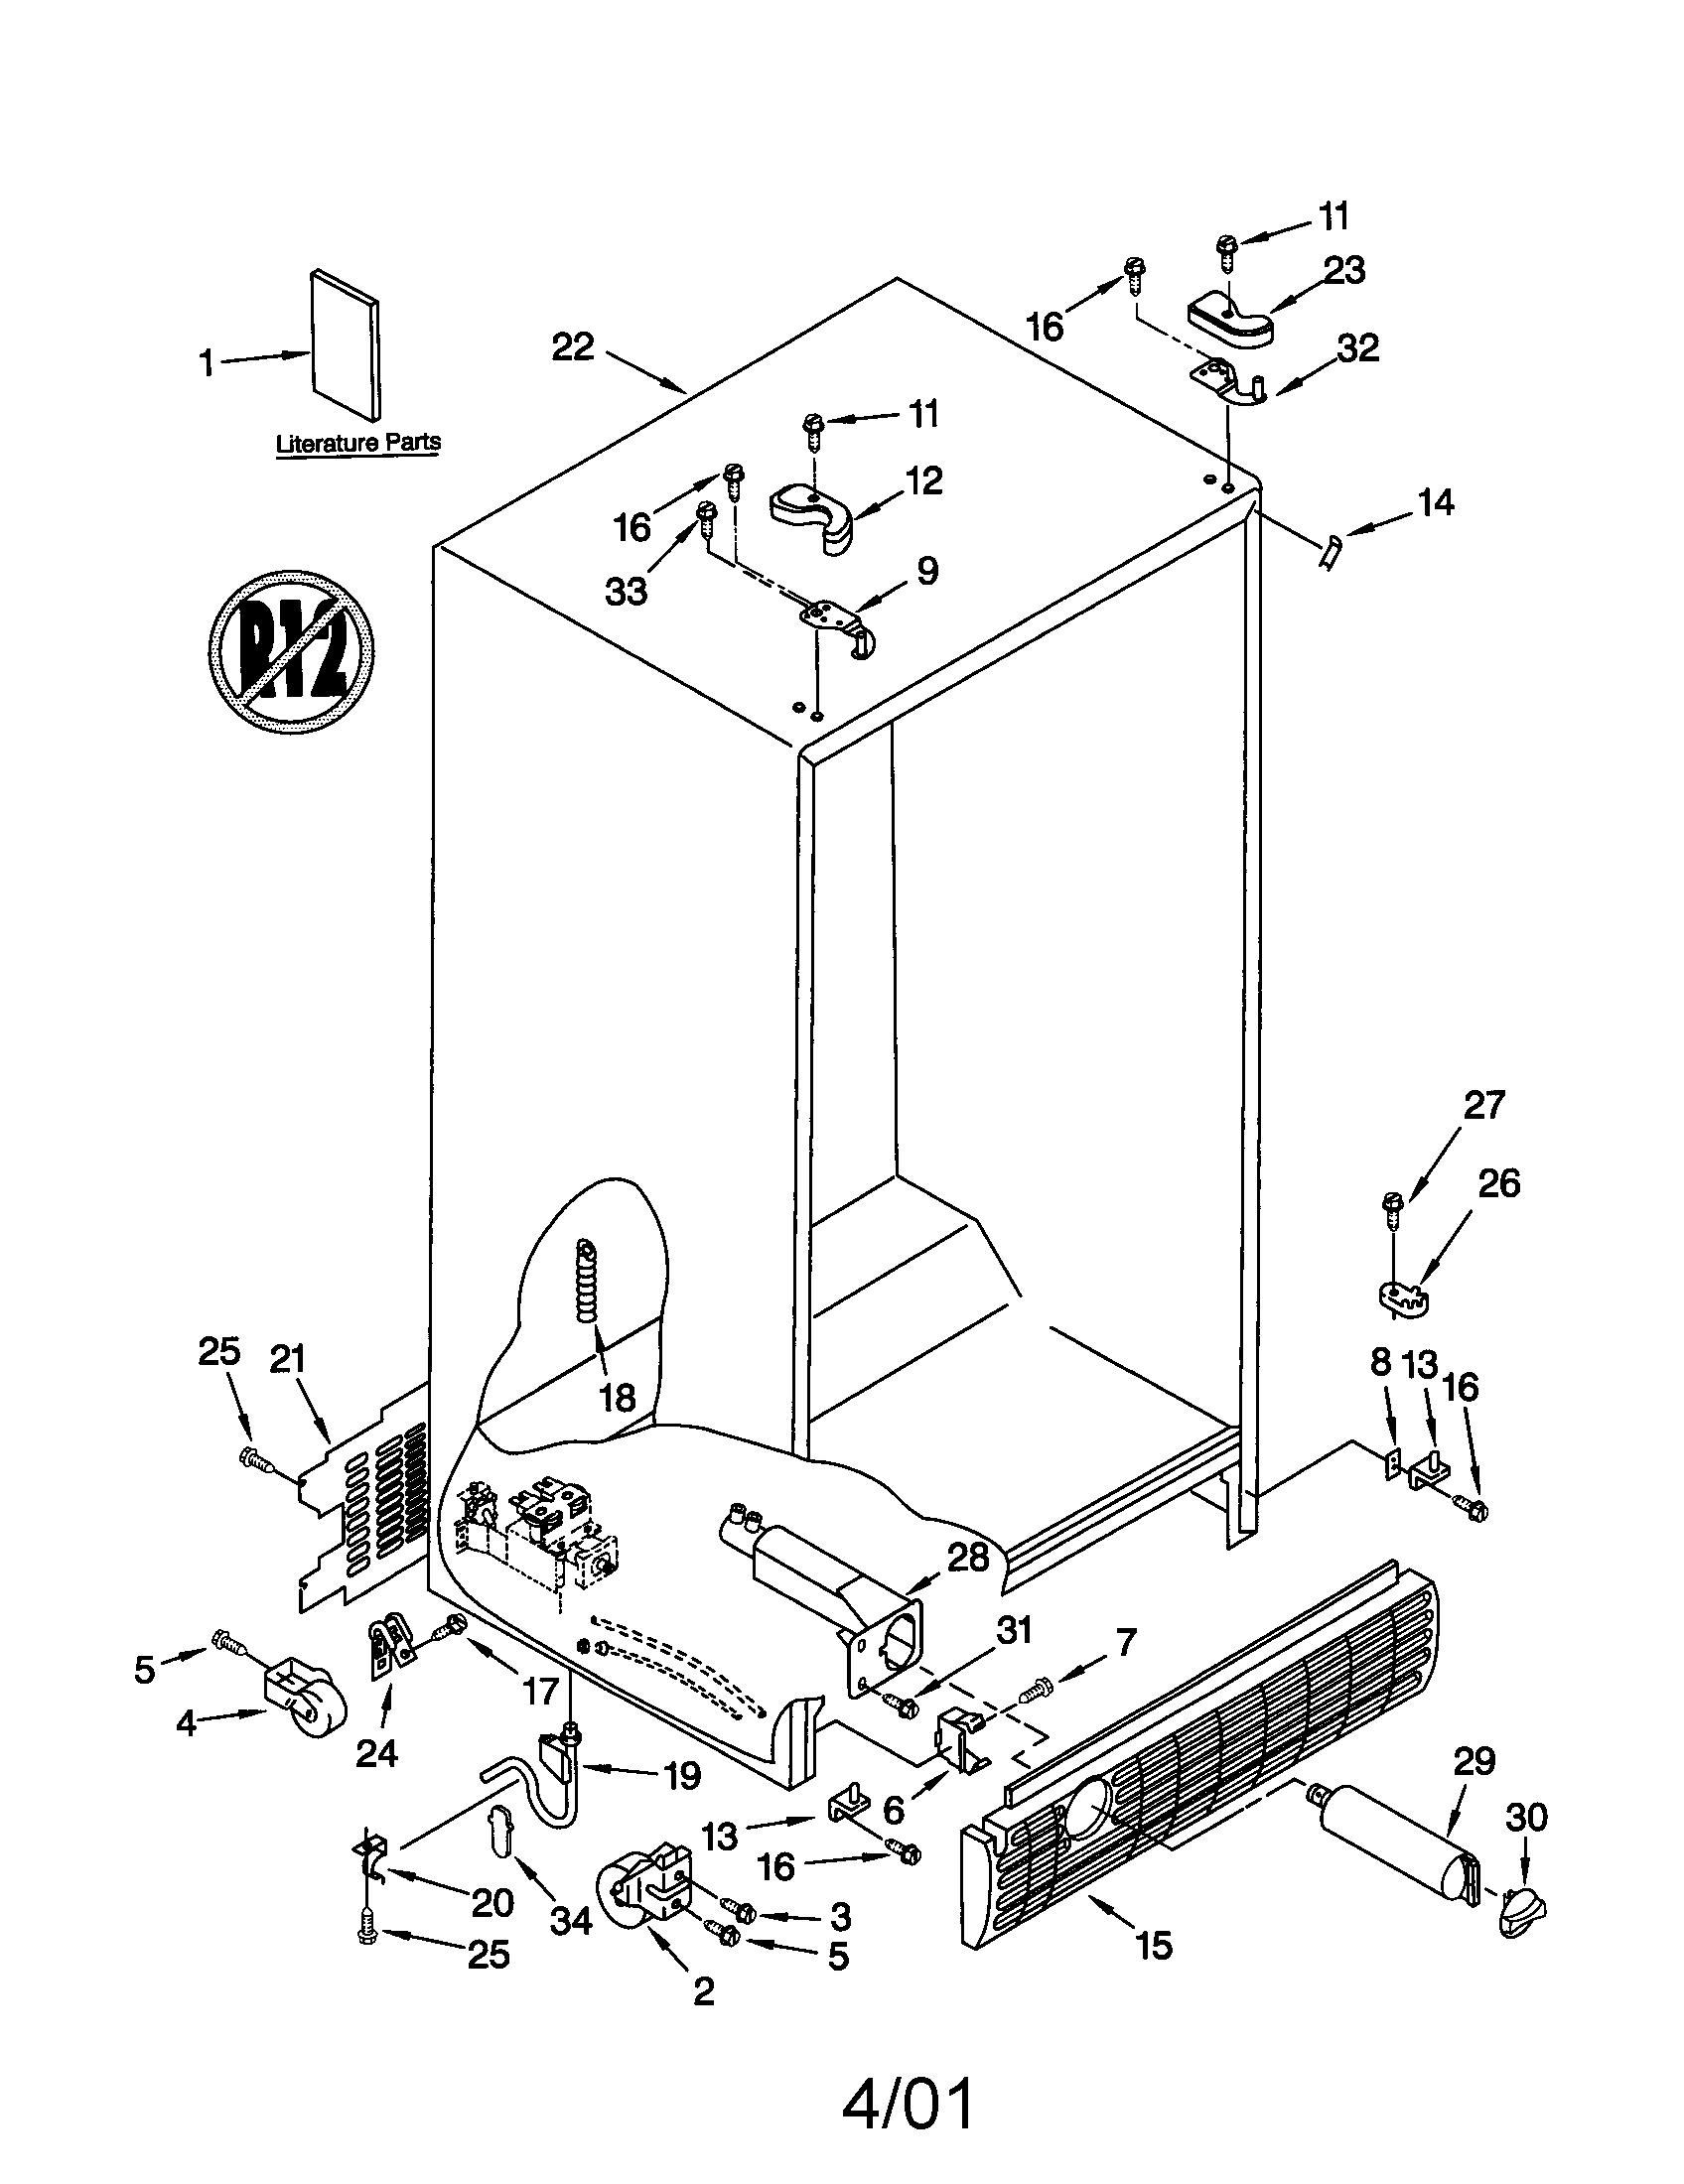 Kenmore model 10652559100 side-by-side refrigerator